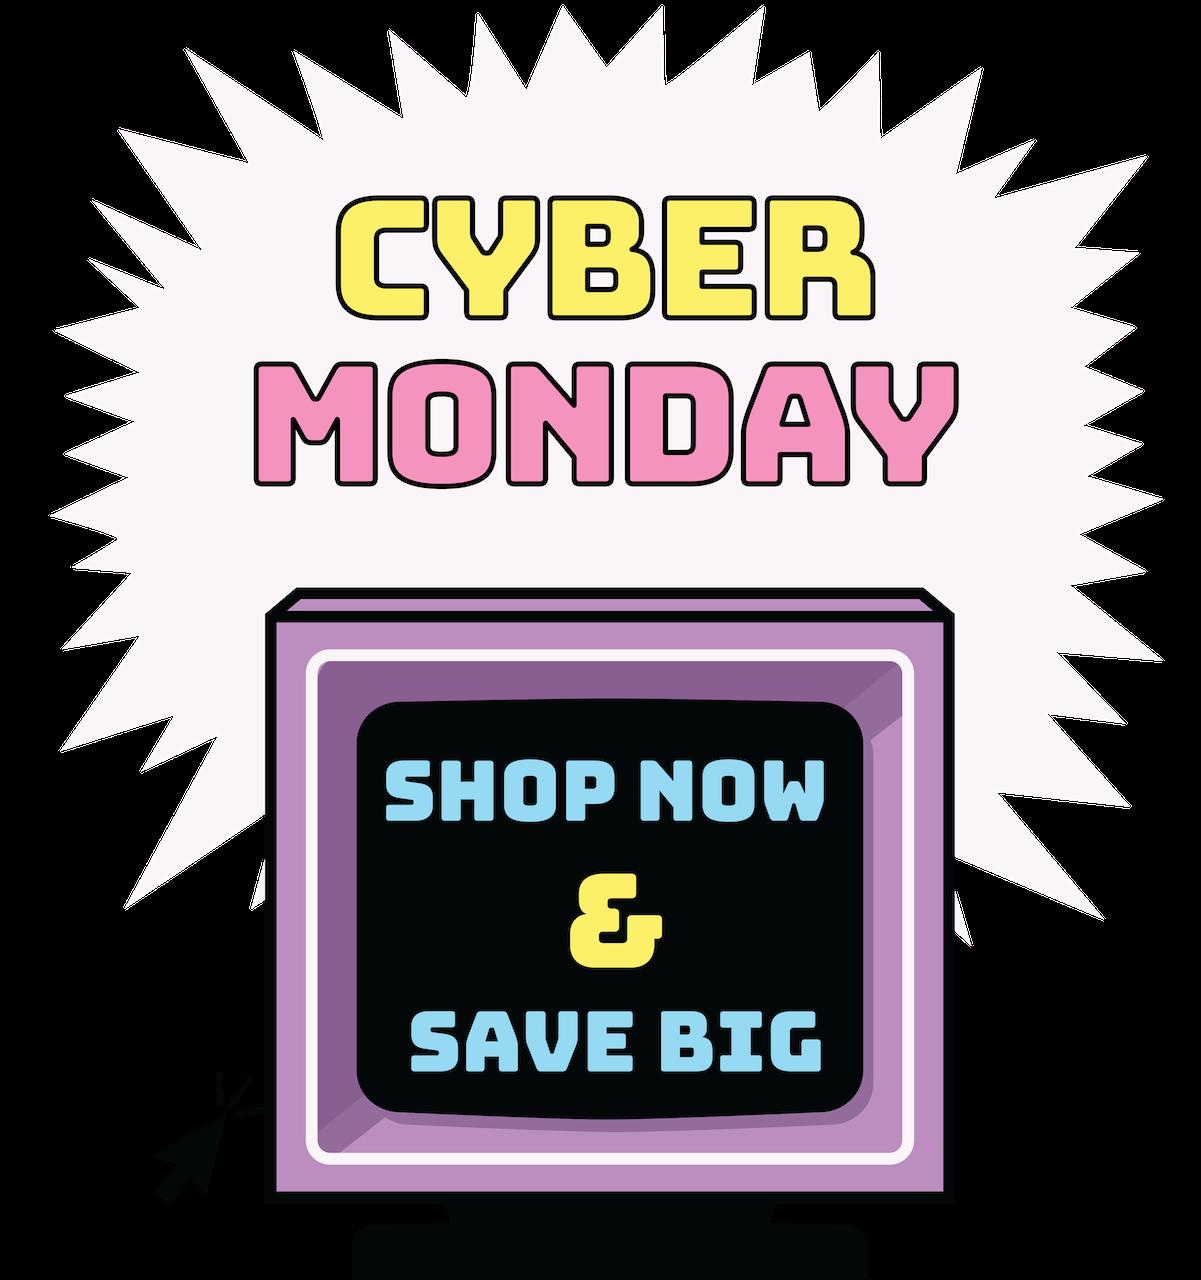 Cyber Monday Hero Image